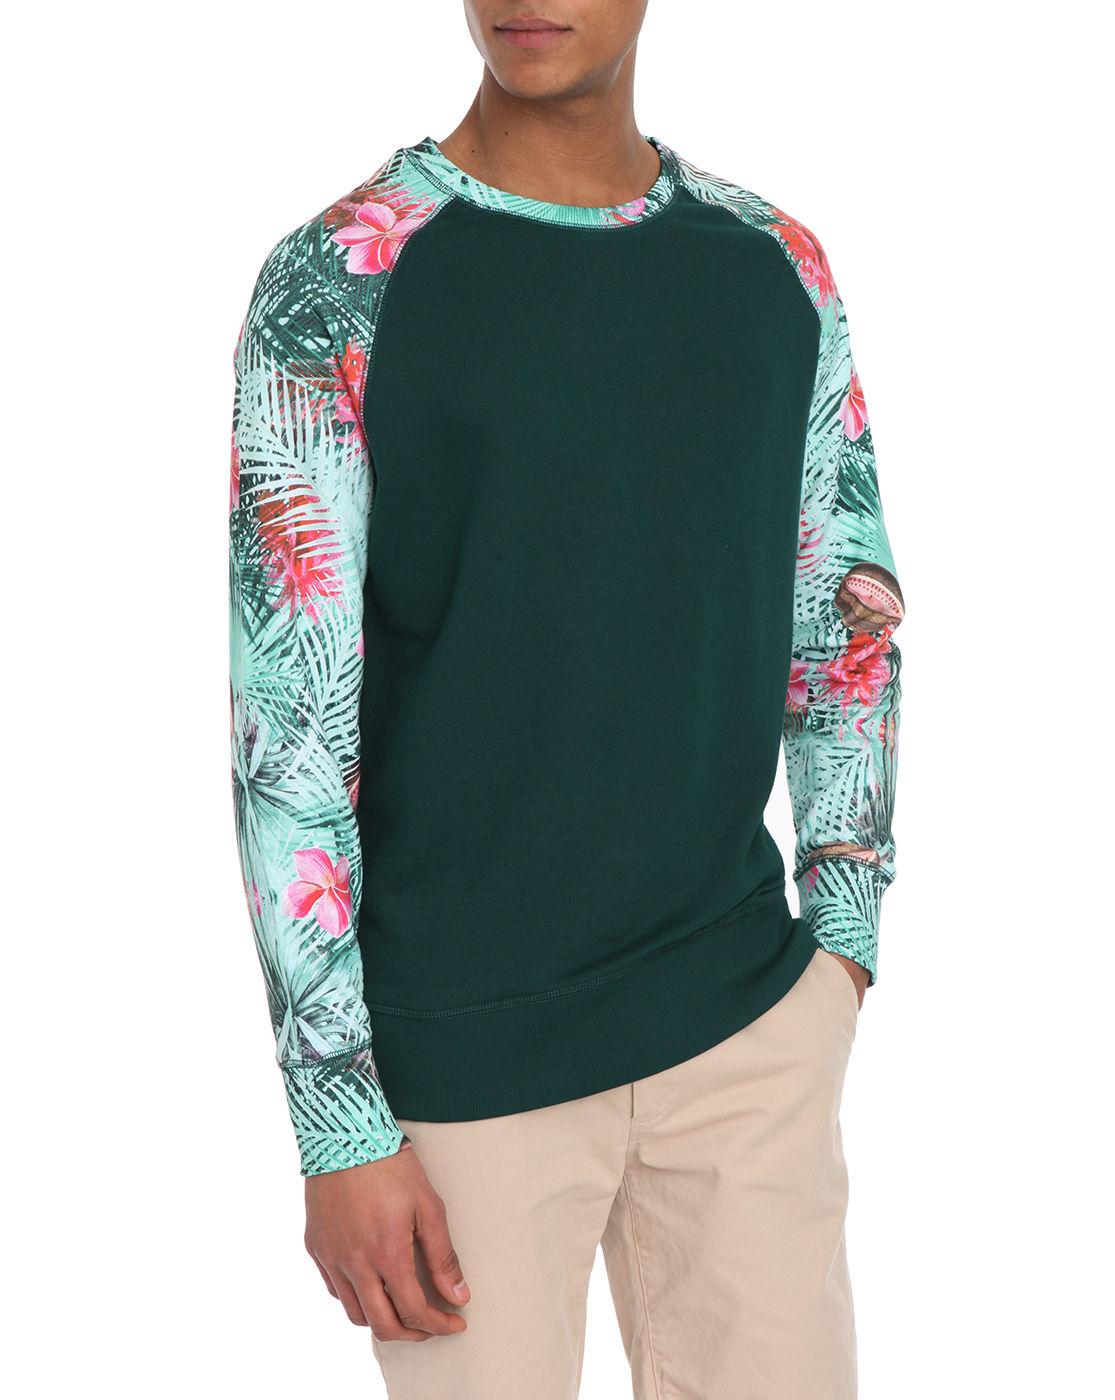 eleven paris raglan flowers sleeve green sweatshirt in green for men lyst. Black Bedroom Furniture Sets. Home Design Ideas